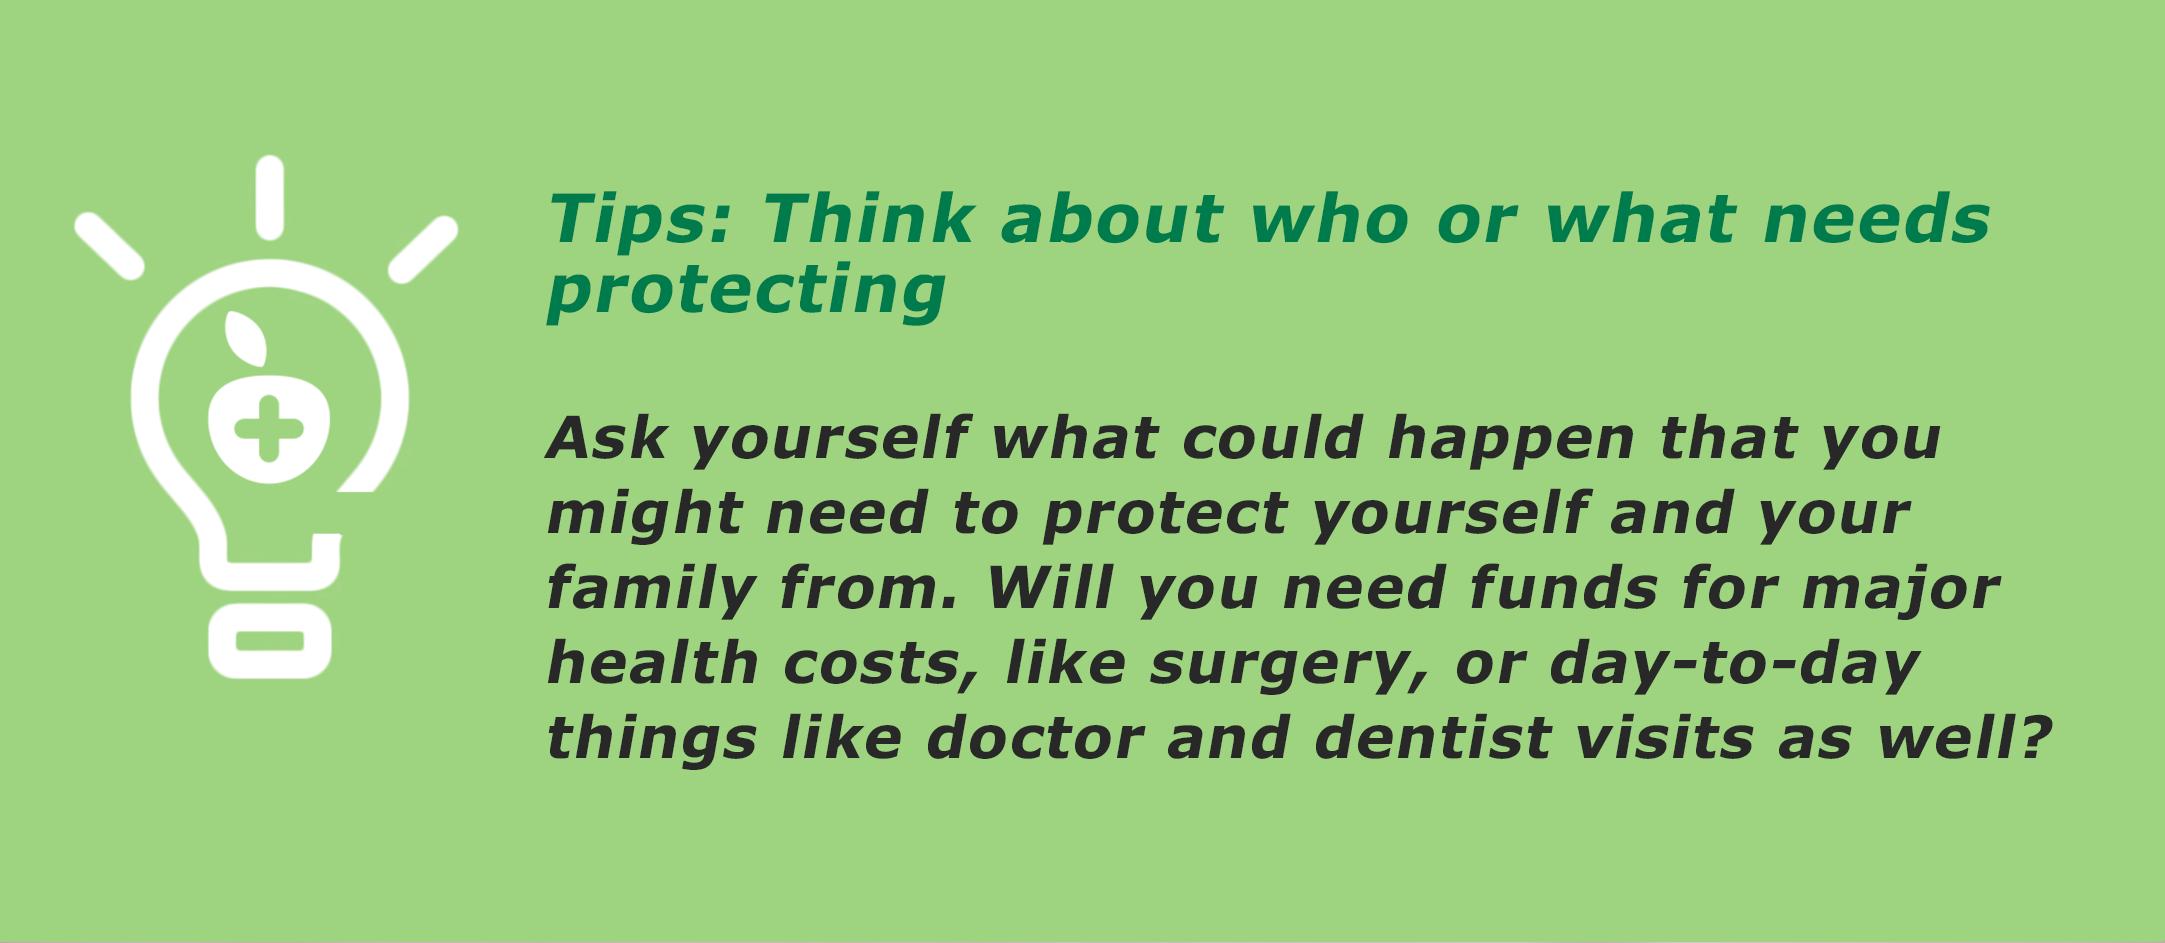 health insurance guide-tip2